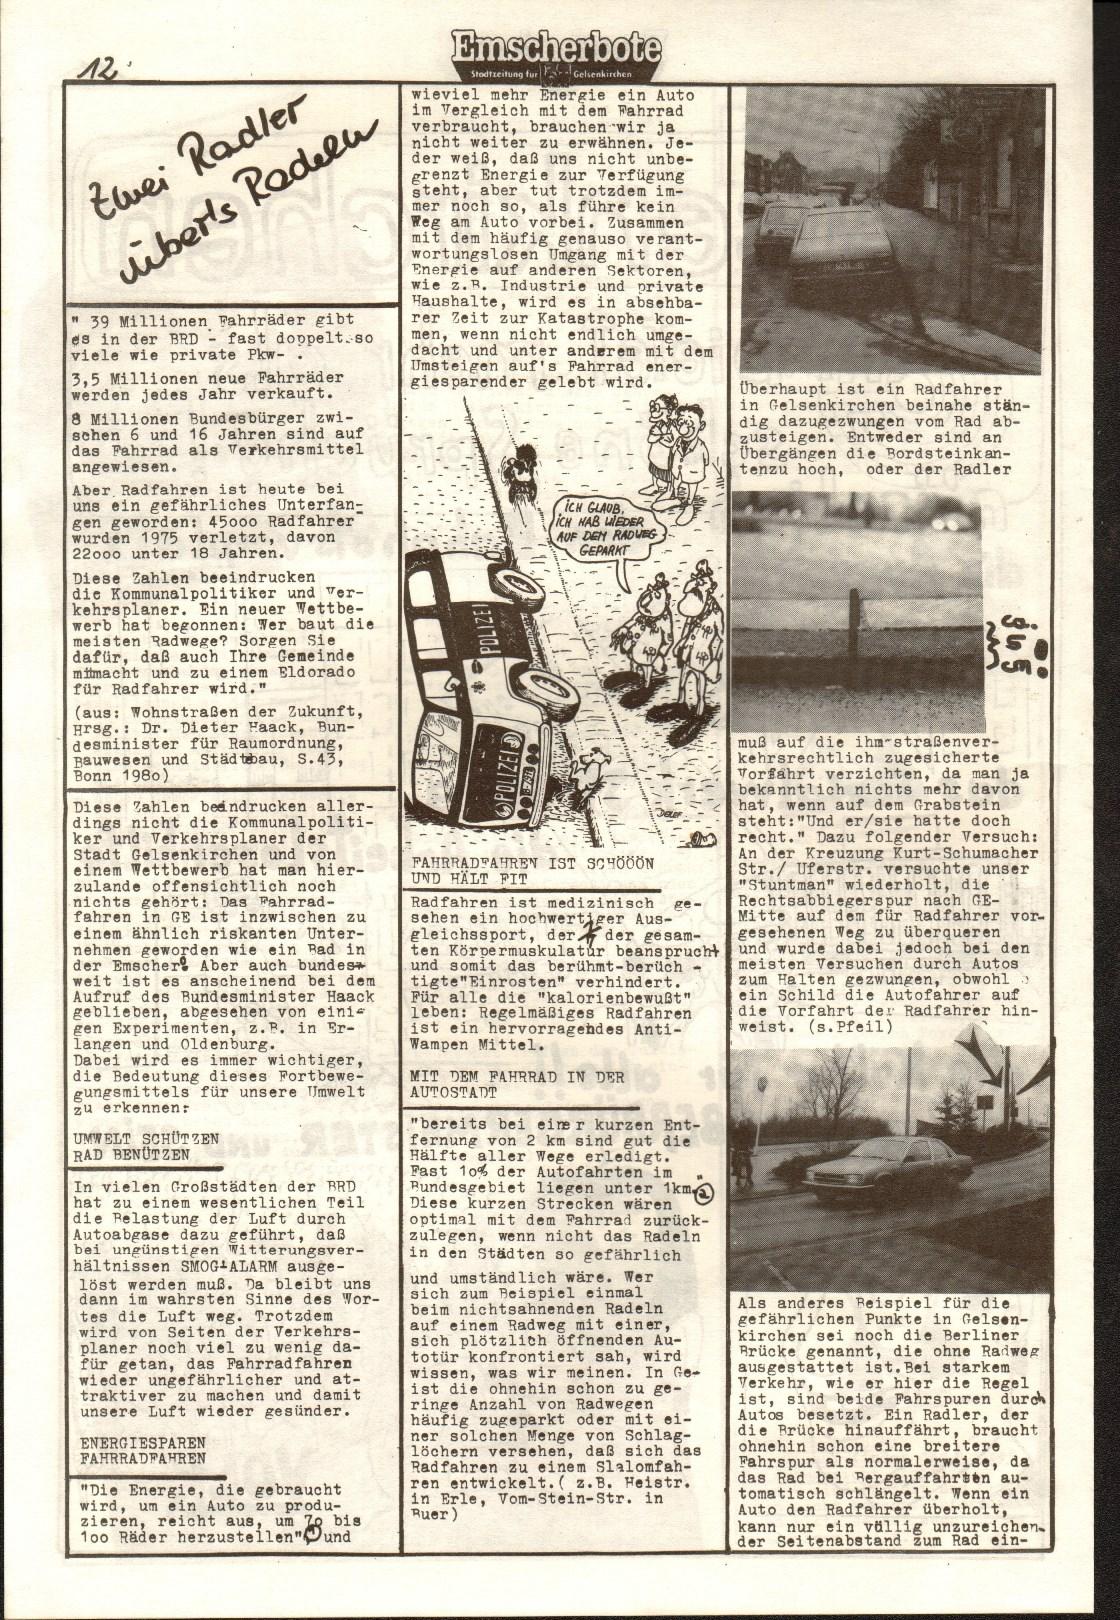 Gelsenkirchen_Emscherbote_1982_18_12